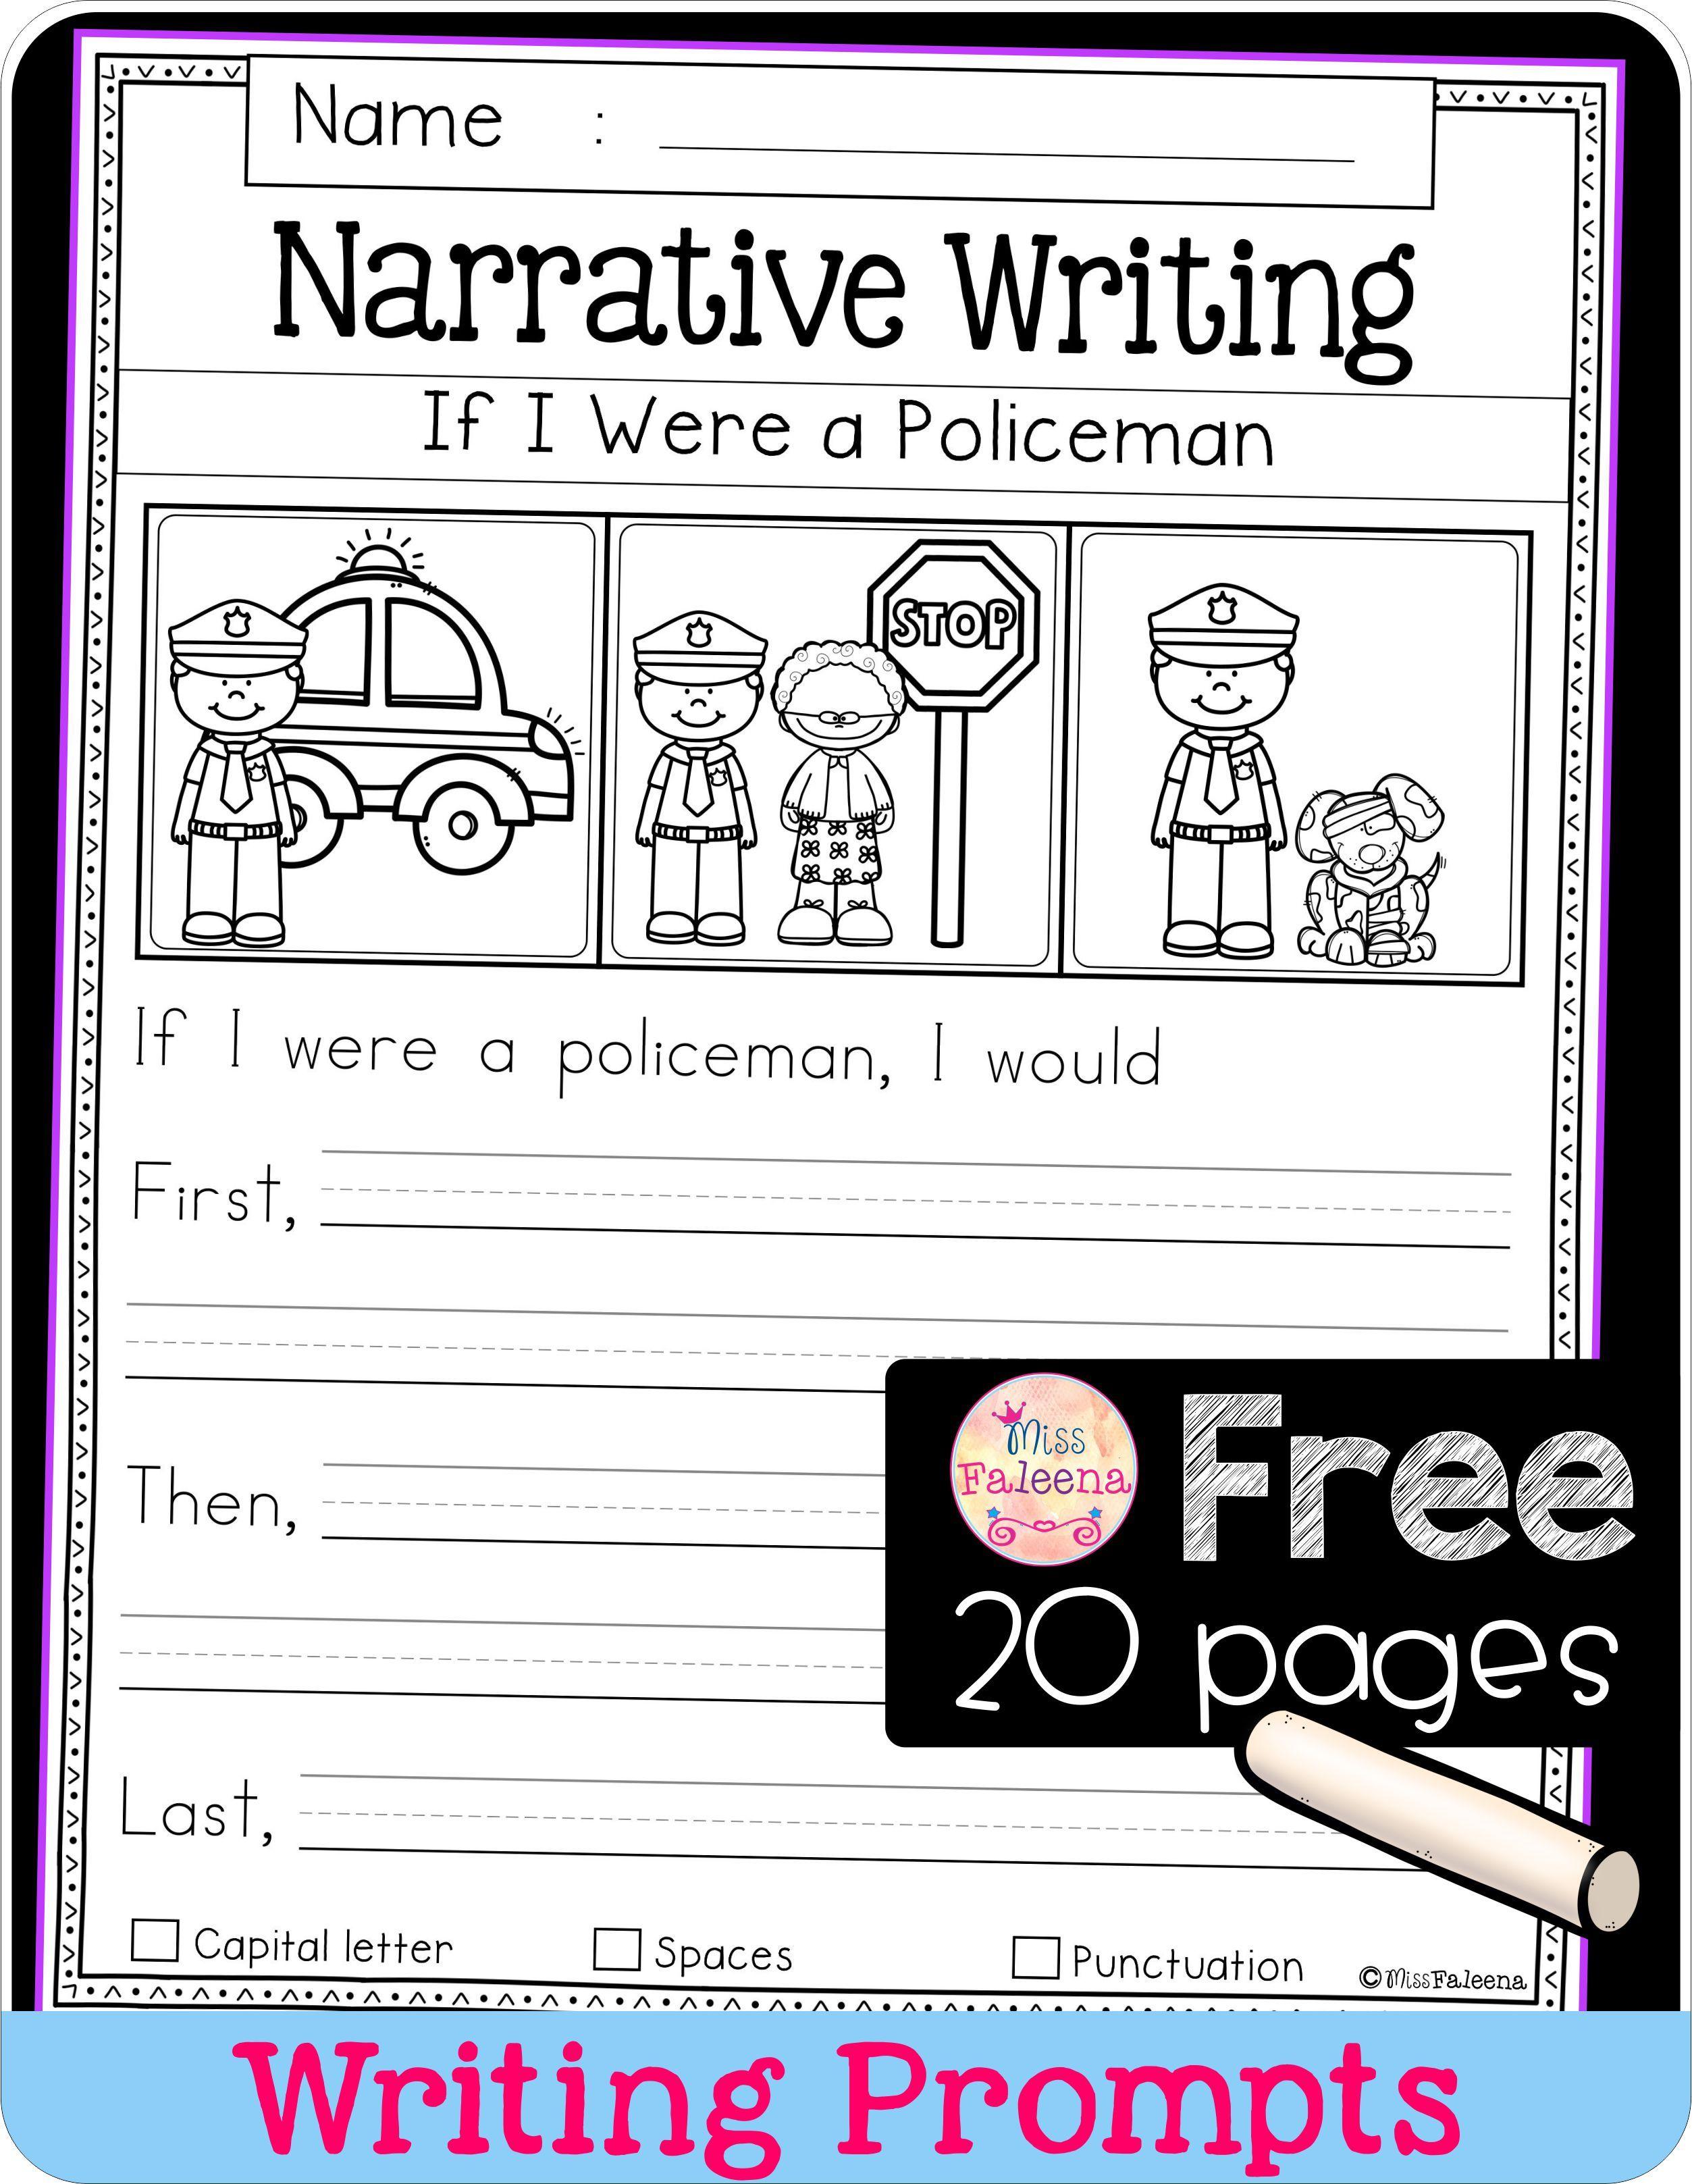 Free Writing Prompts Free Writing Prompts Writing Prompts Freewriting [ 3234 x 2506 Pixel ]